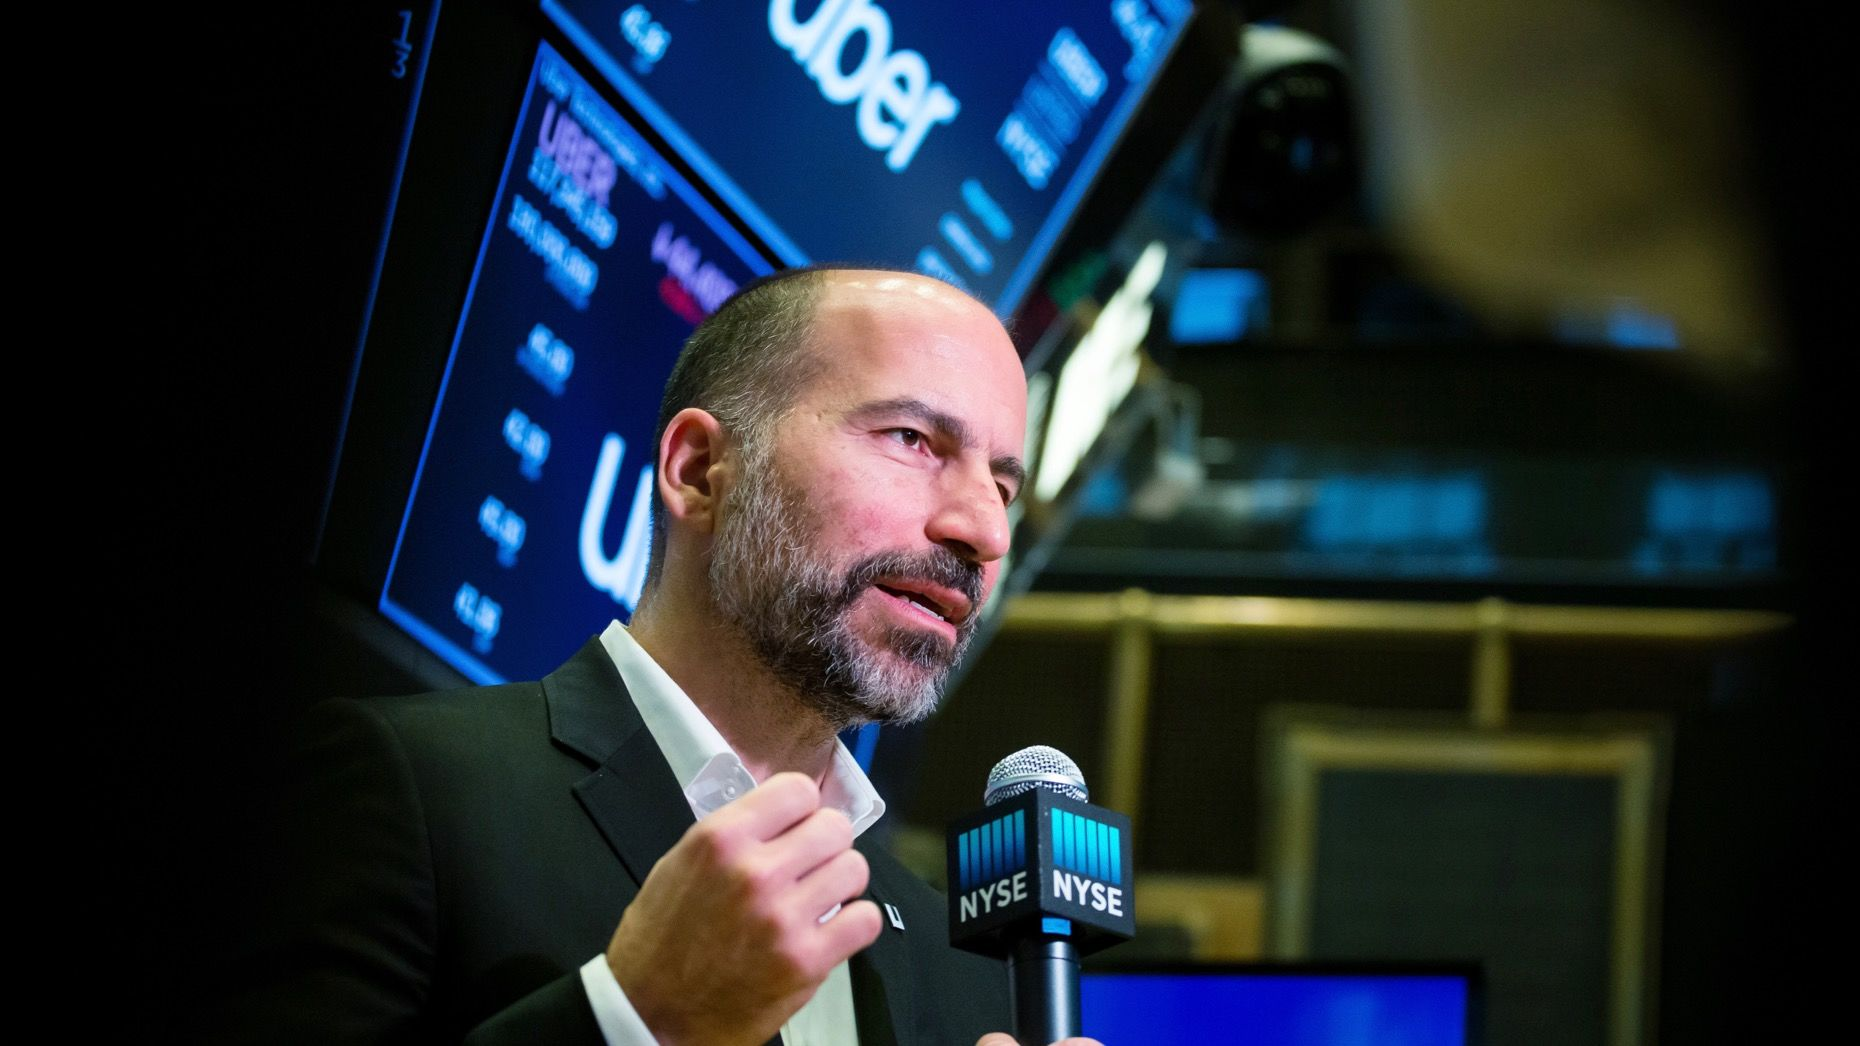 Uber CEO Dara Khosrowshahi. Photo by Bloomberg